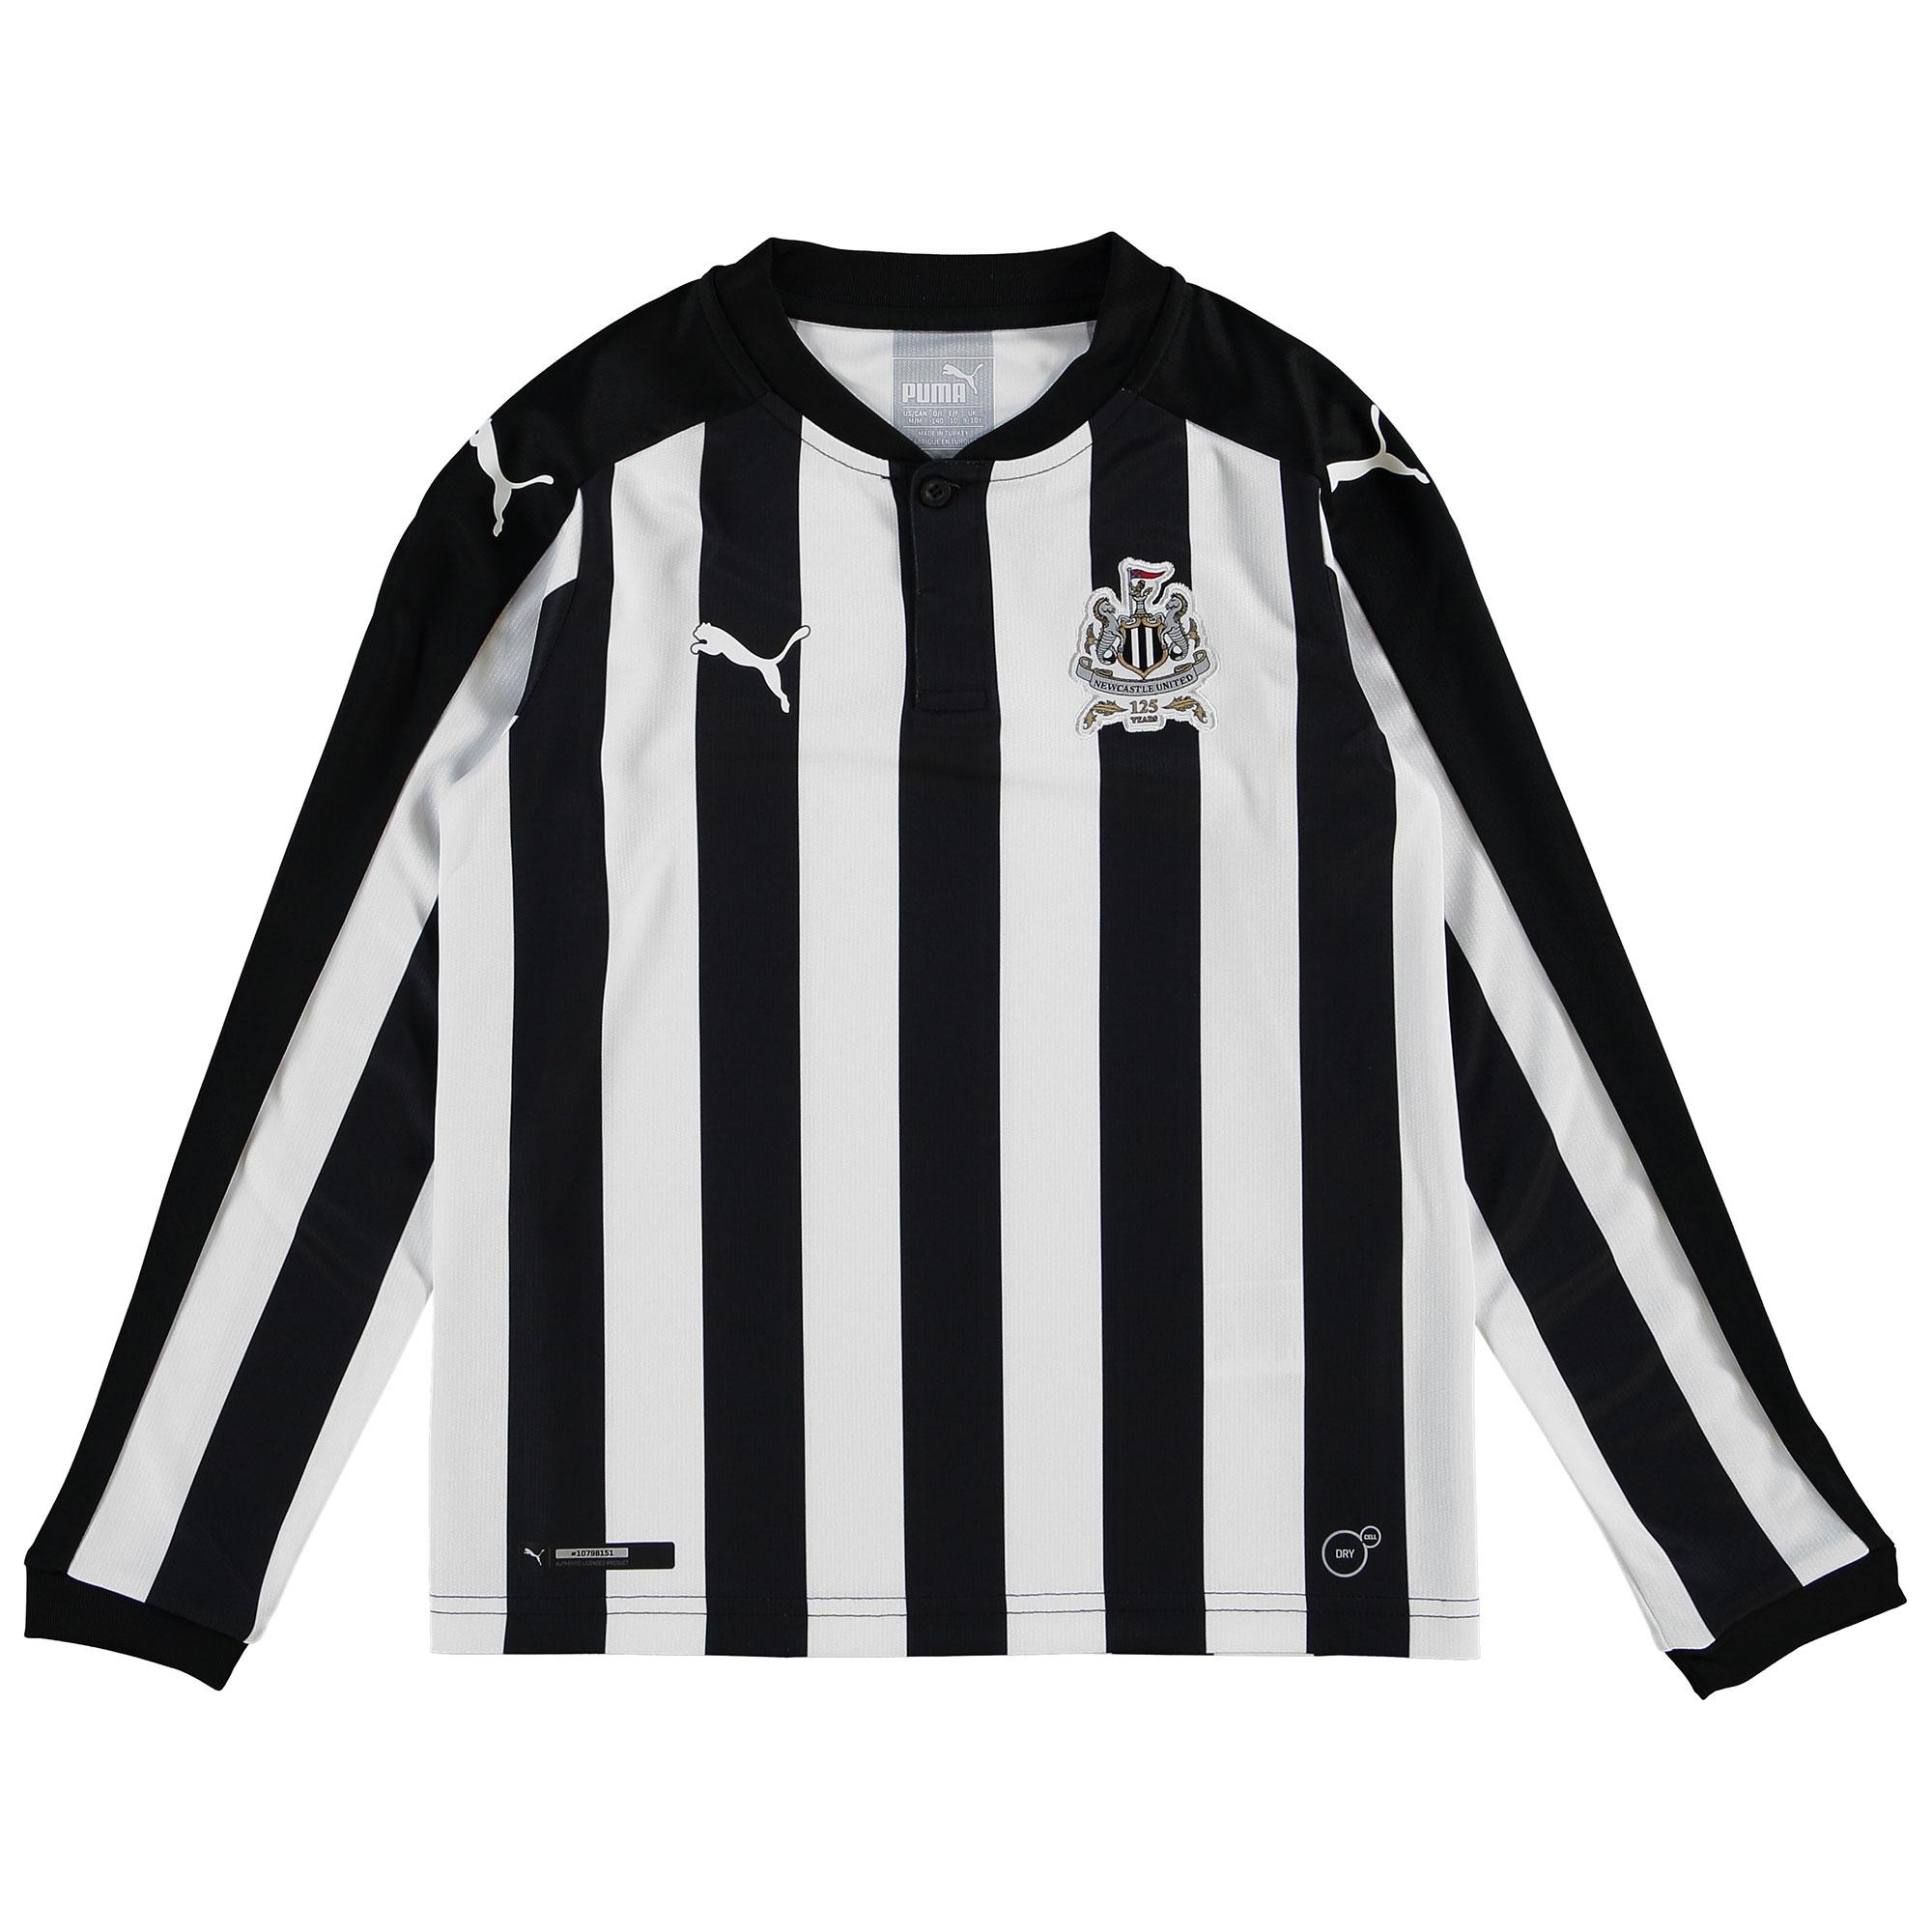 Newcastle United Home Shirt 2017-18 - Kids - Long Sleeve